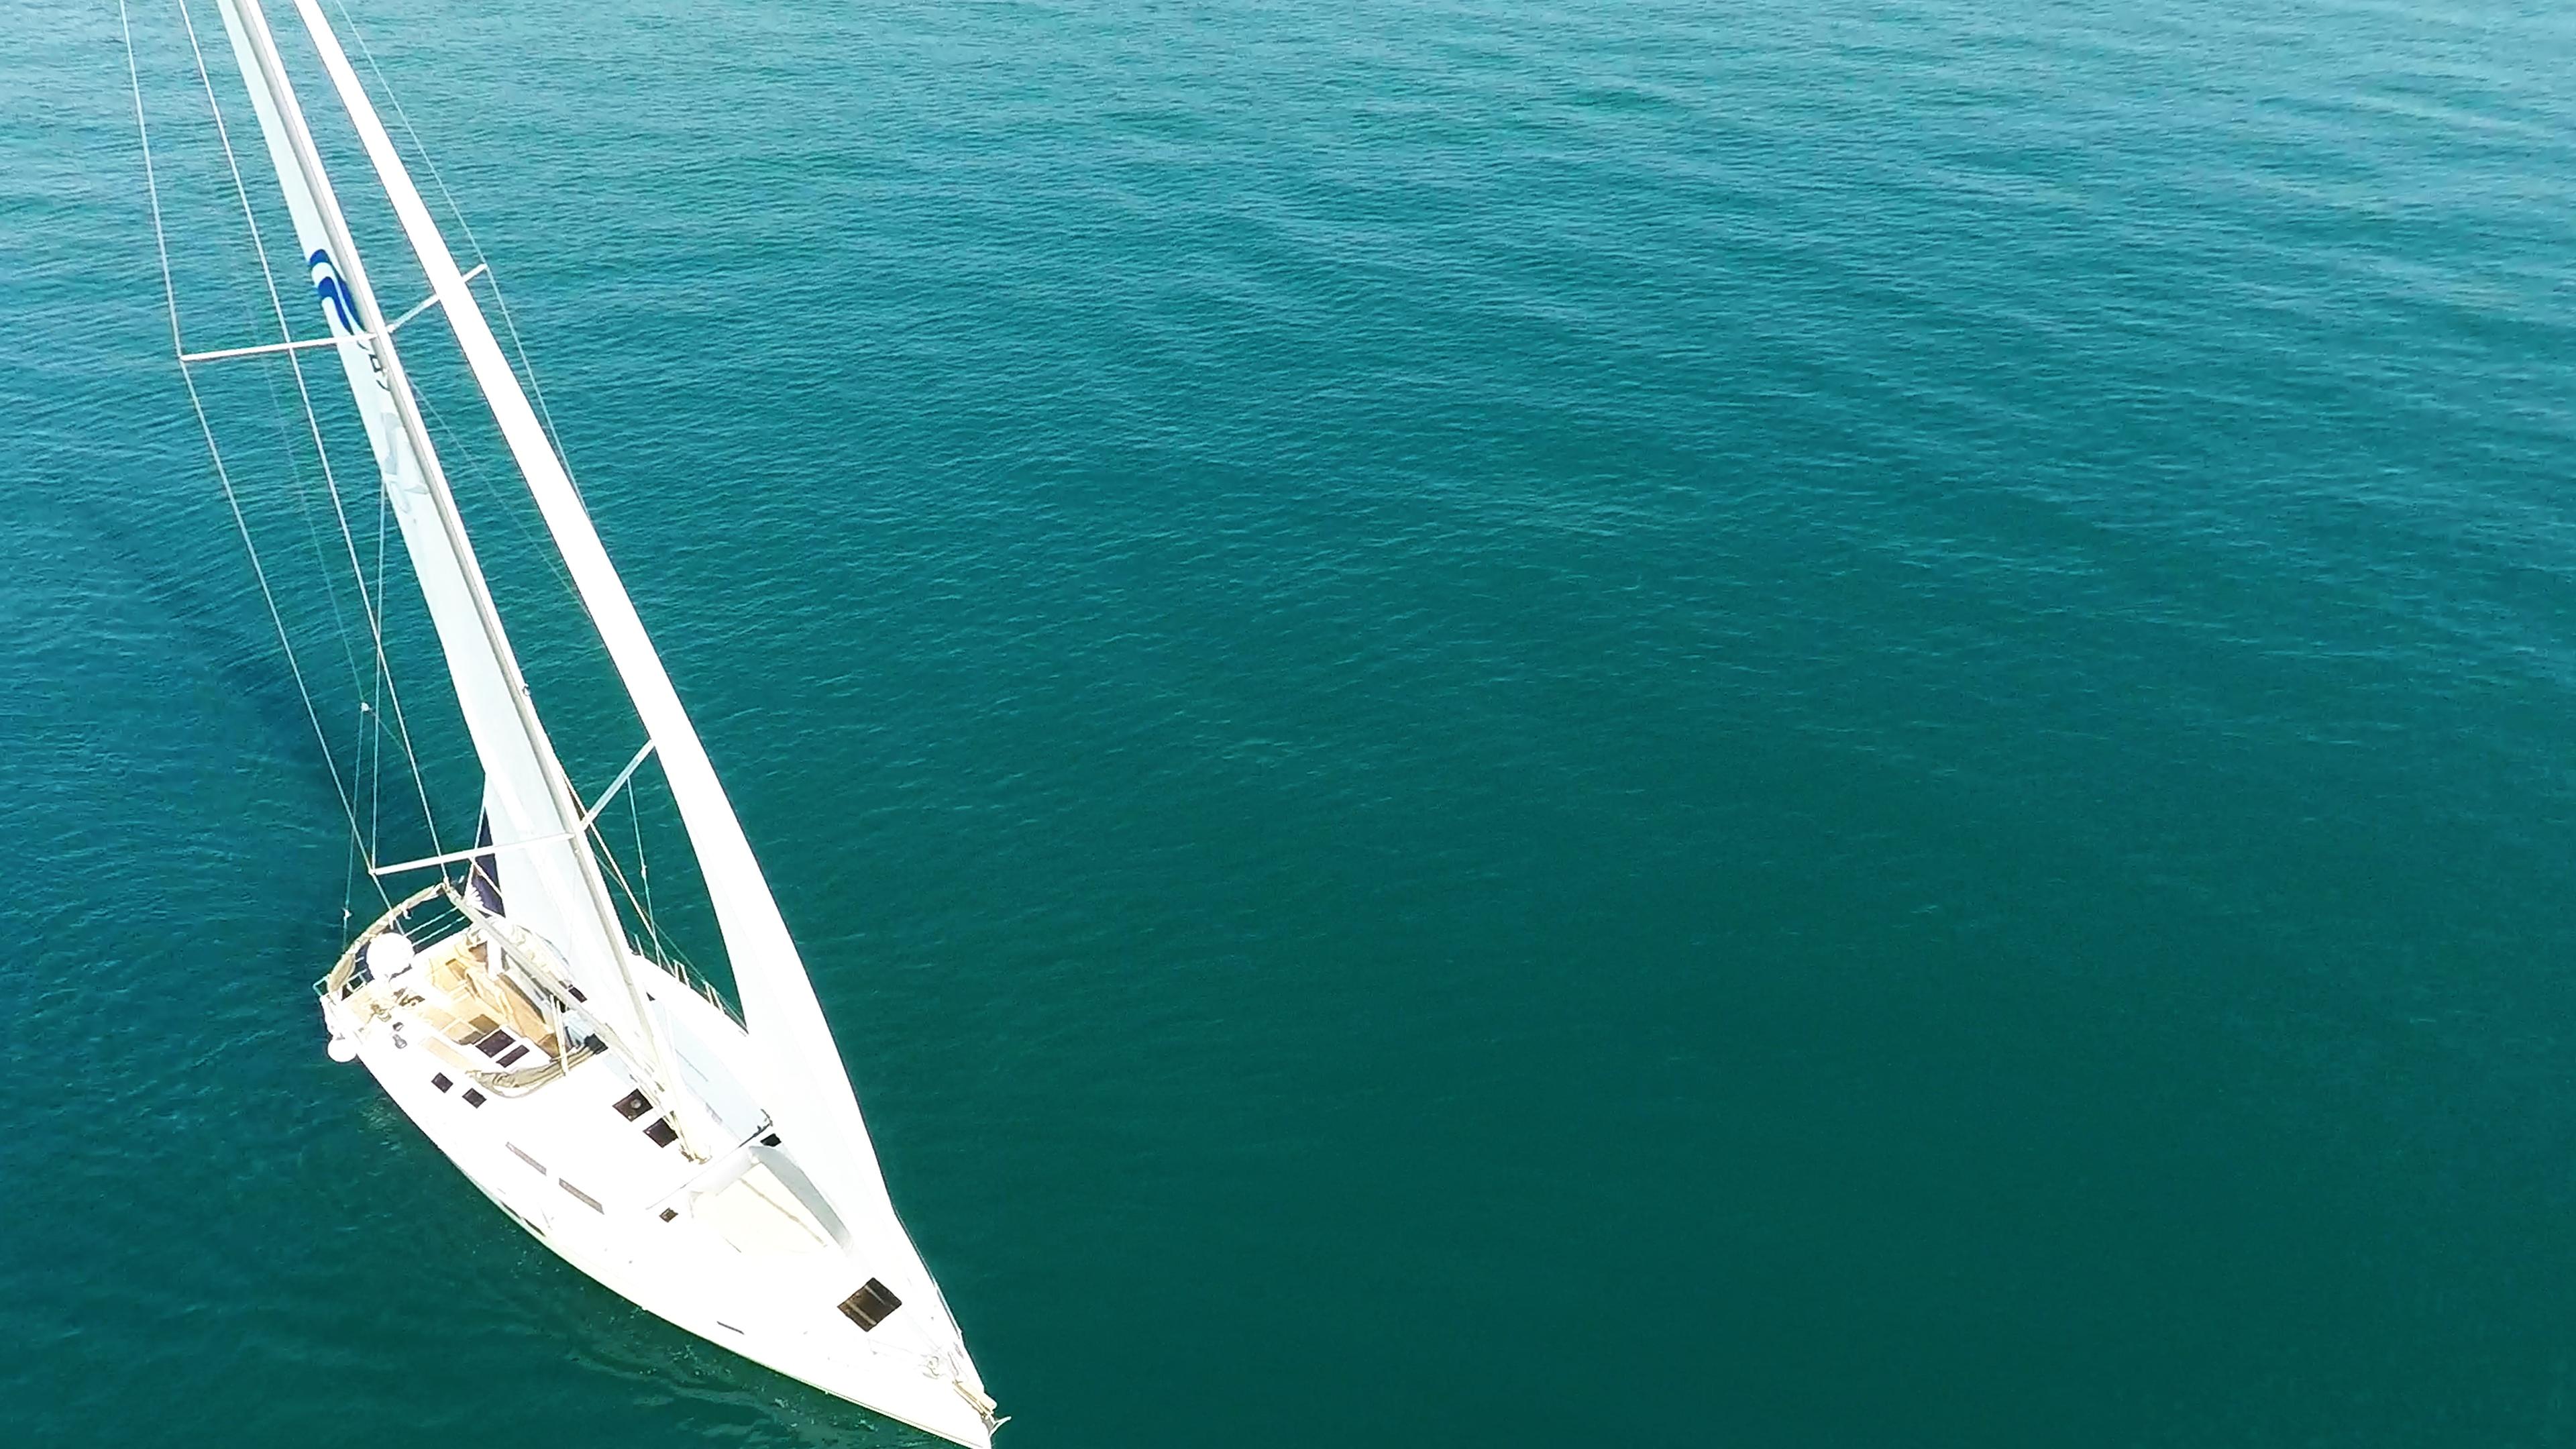 barcha a vela barca a vela veleggiare vista dall'alto